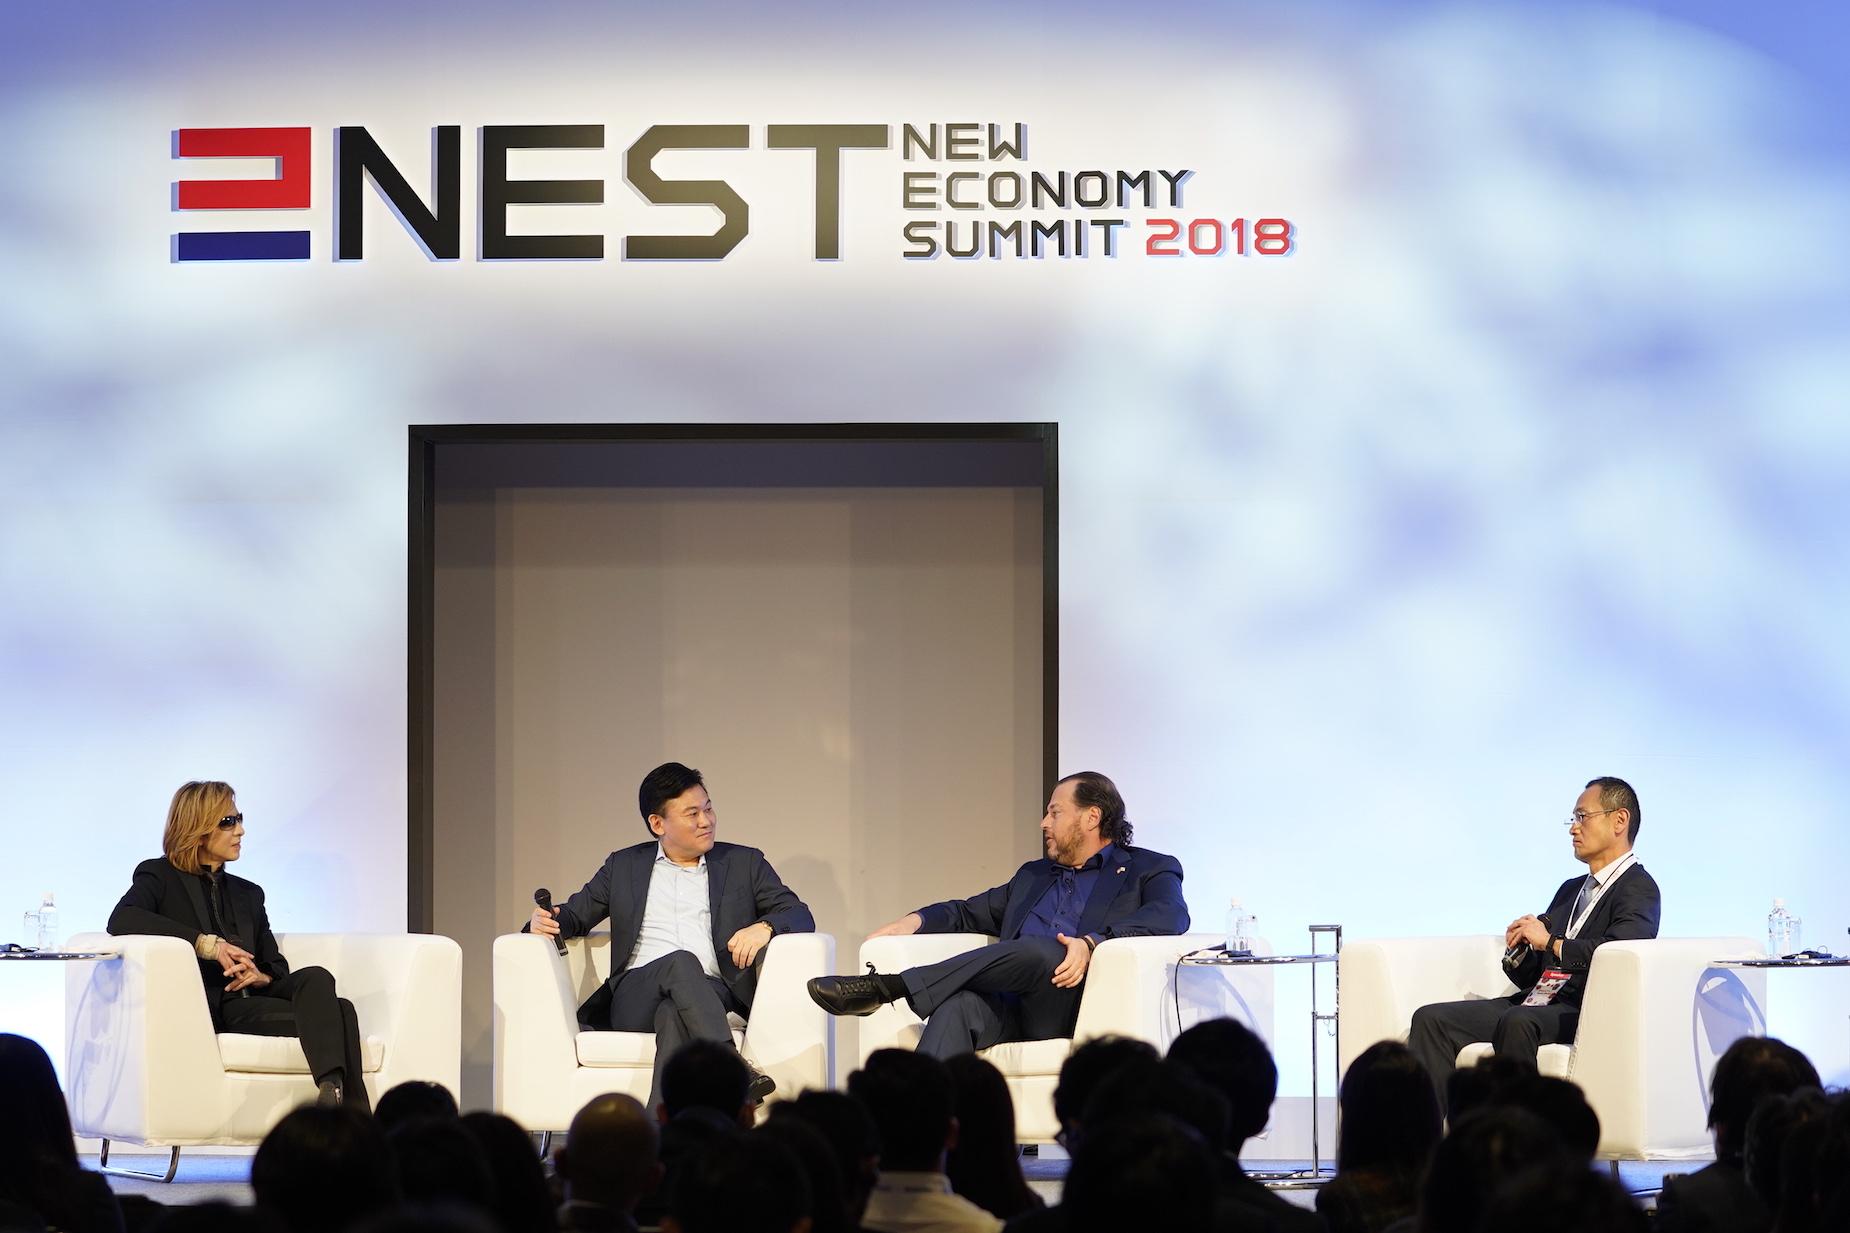 A panel discussion between Hiroshi Mikitani, Marc Benioff, Nobel Laureate Dr. Shinya Yamanaka and iconic Japanese rockstar, Yoshiki, headlined NEST 2018.